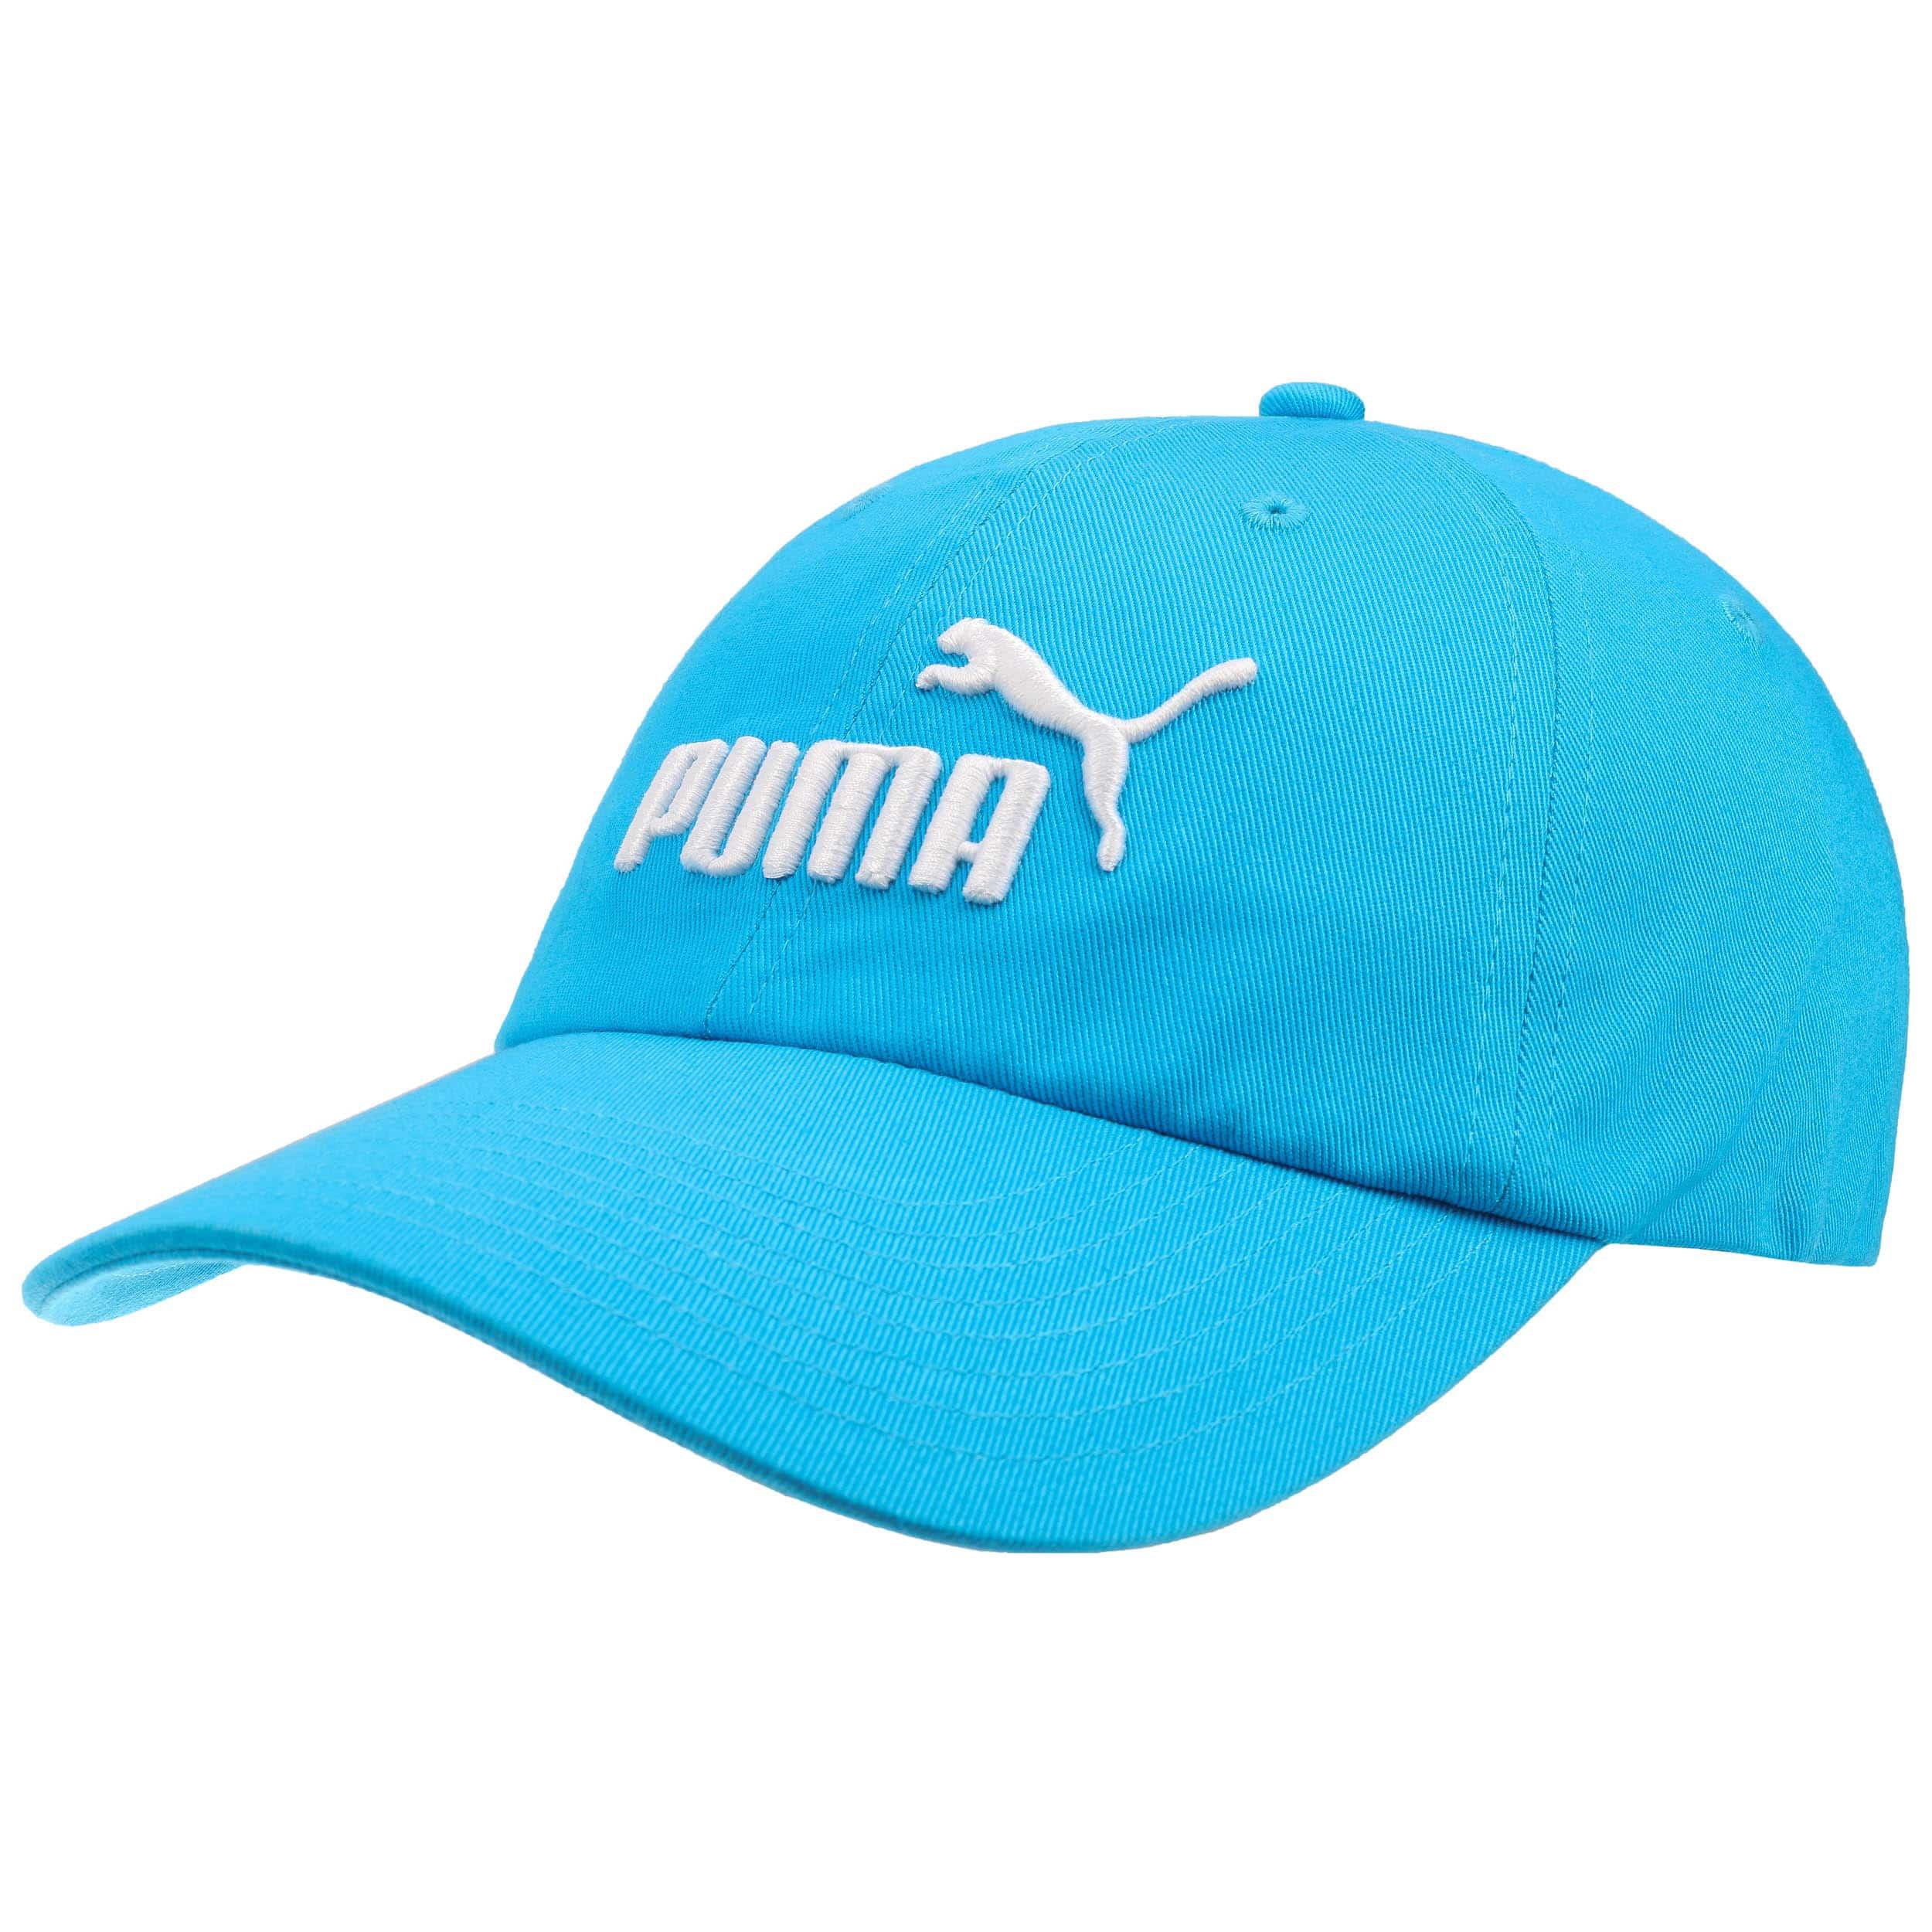 7f612759574c 1 Baseball Cap by PUMA - turquoise 5 ...